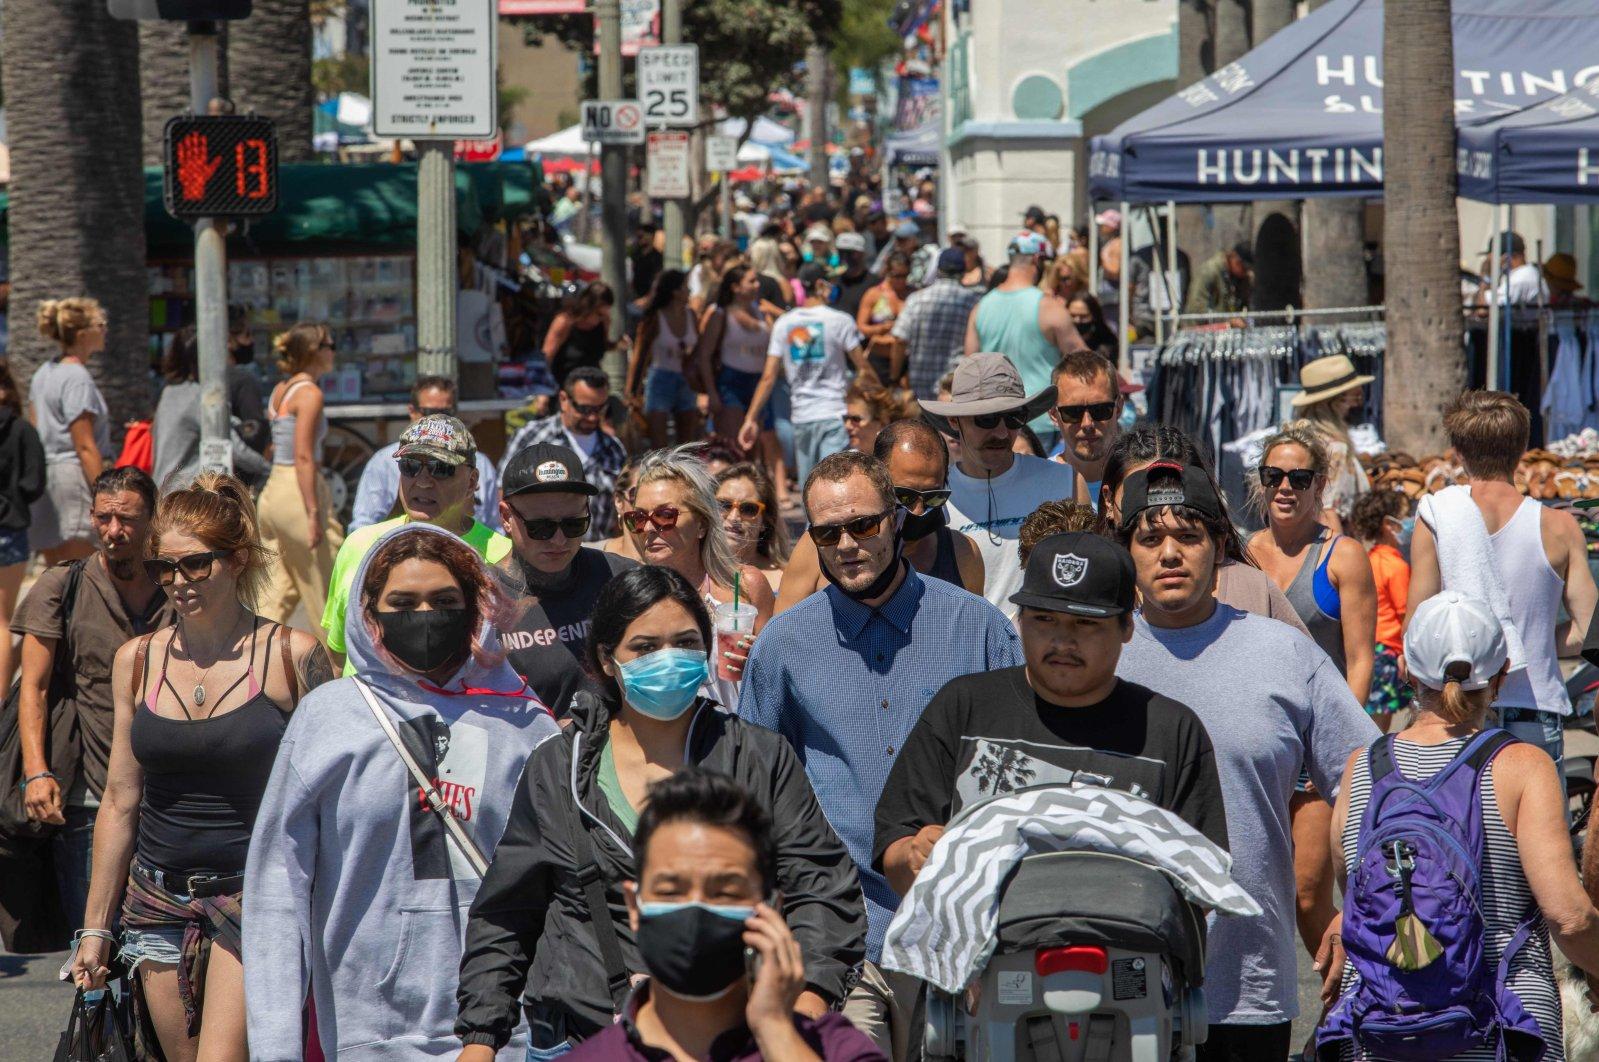 People cross the street in Huntington Beach, California, U.S., July 19, 2020. (AFP Photo)